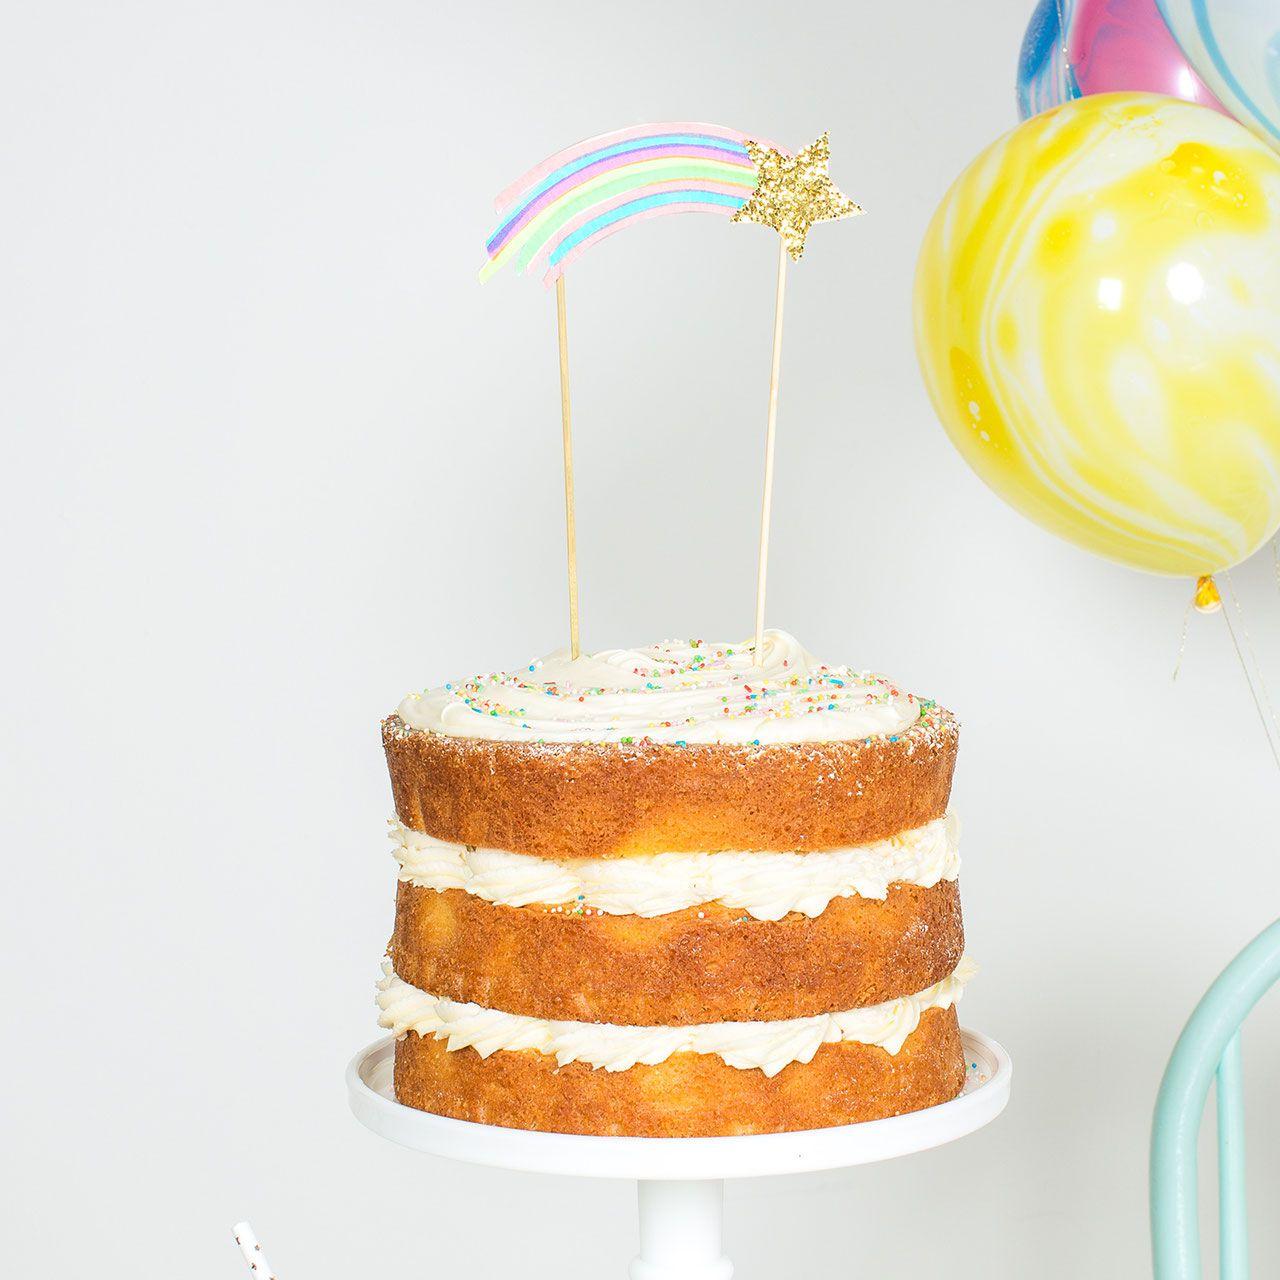 d coration gateau pour anniversaire licorne cake topper rainbow for unicorn birthday. Black Bedroom Furniture Sets. Home Design Ideas